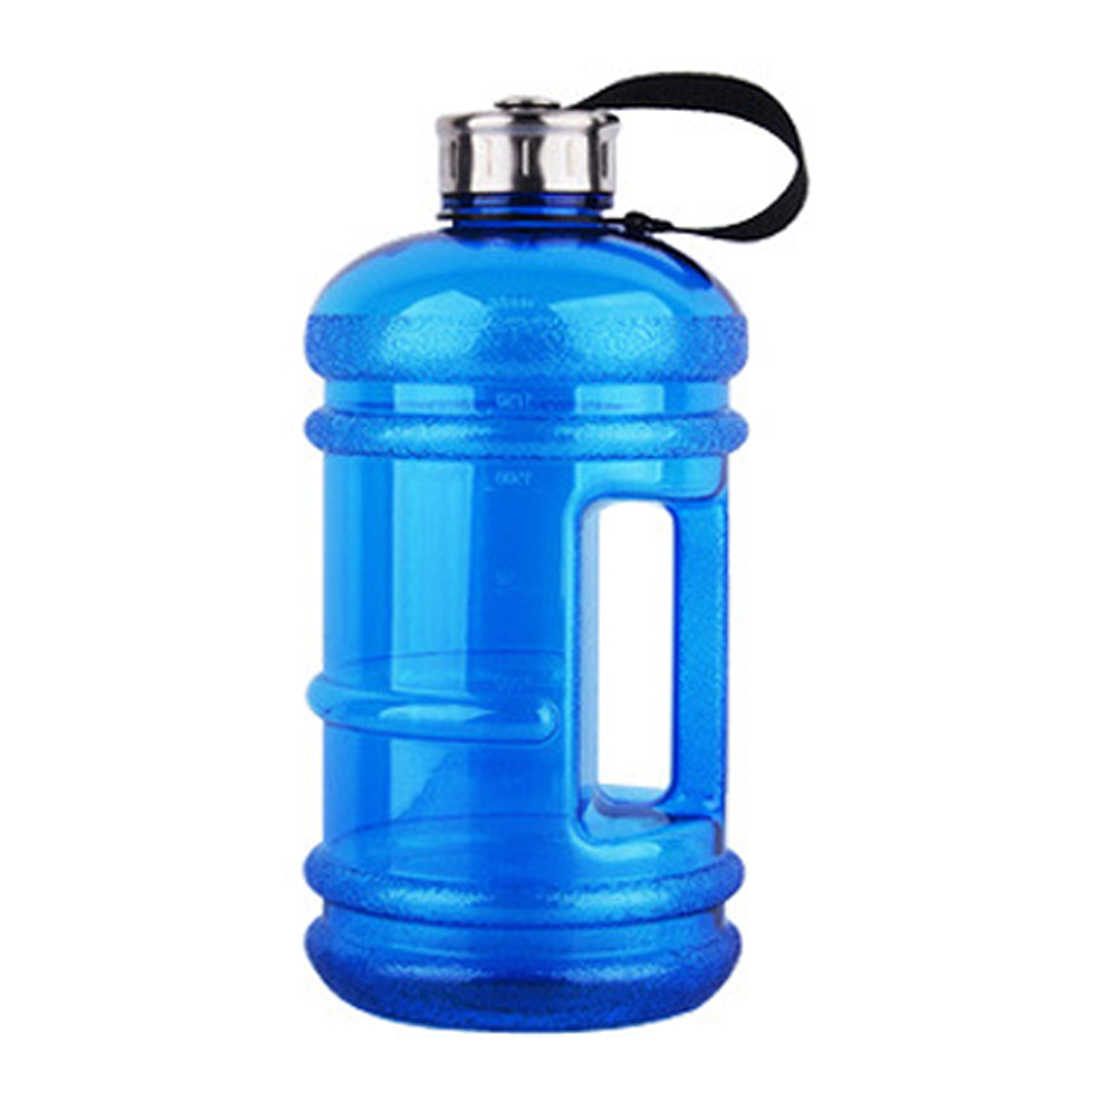 Large Capacity Water Bottles Outdoor Sports Half Gallon Bottles Training Camping